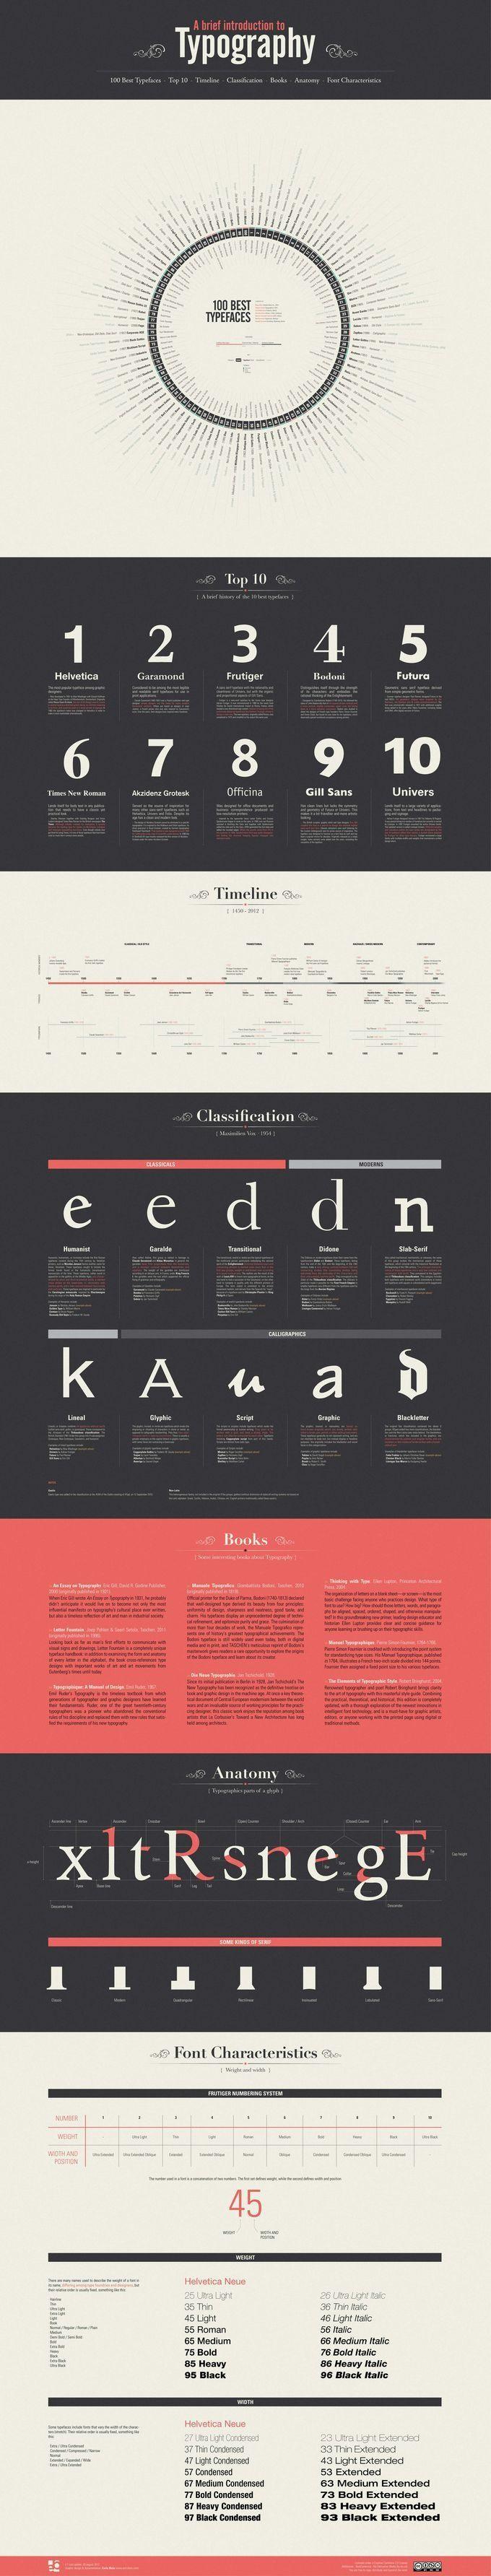 Introduction to typography.  | Ipseity Creative | ipseitycreative.com/ | 573-803-2875 |